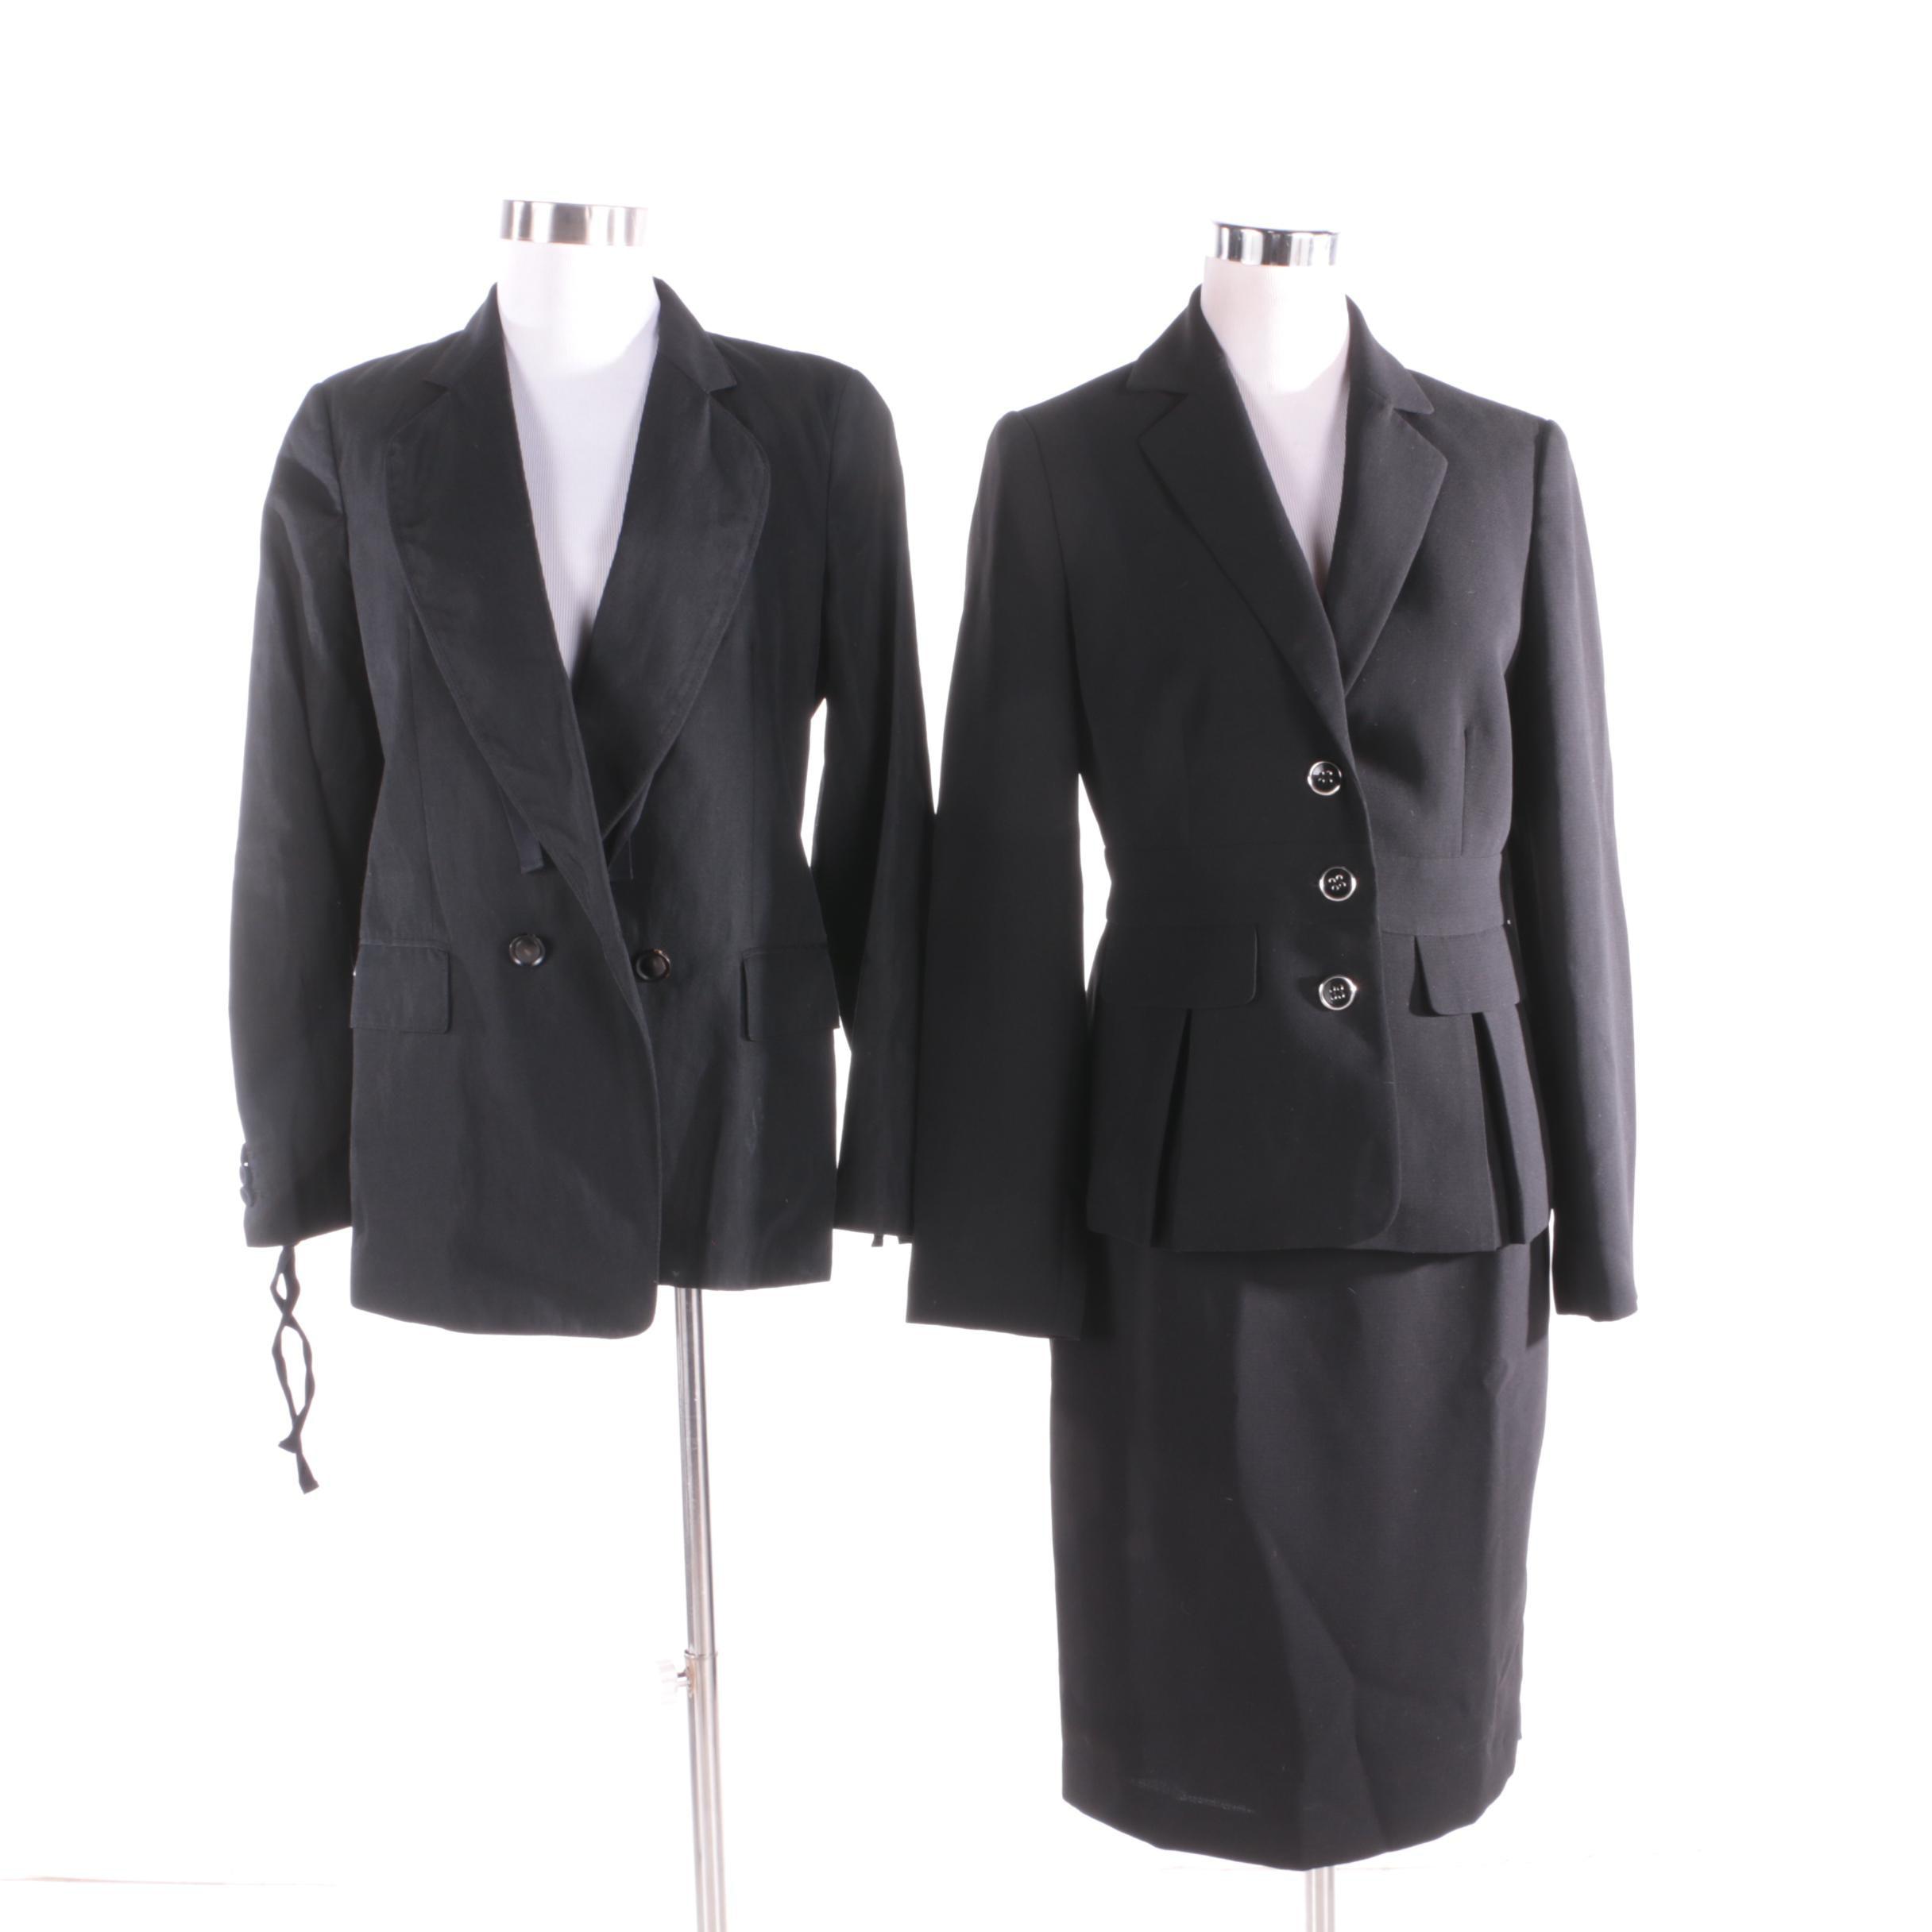 Women's Calvin Klein Skirt Suit and 3.1 Phillip Lim Jacket